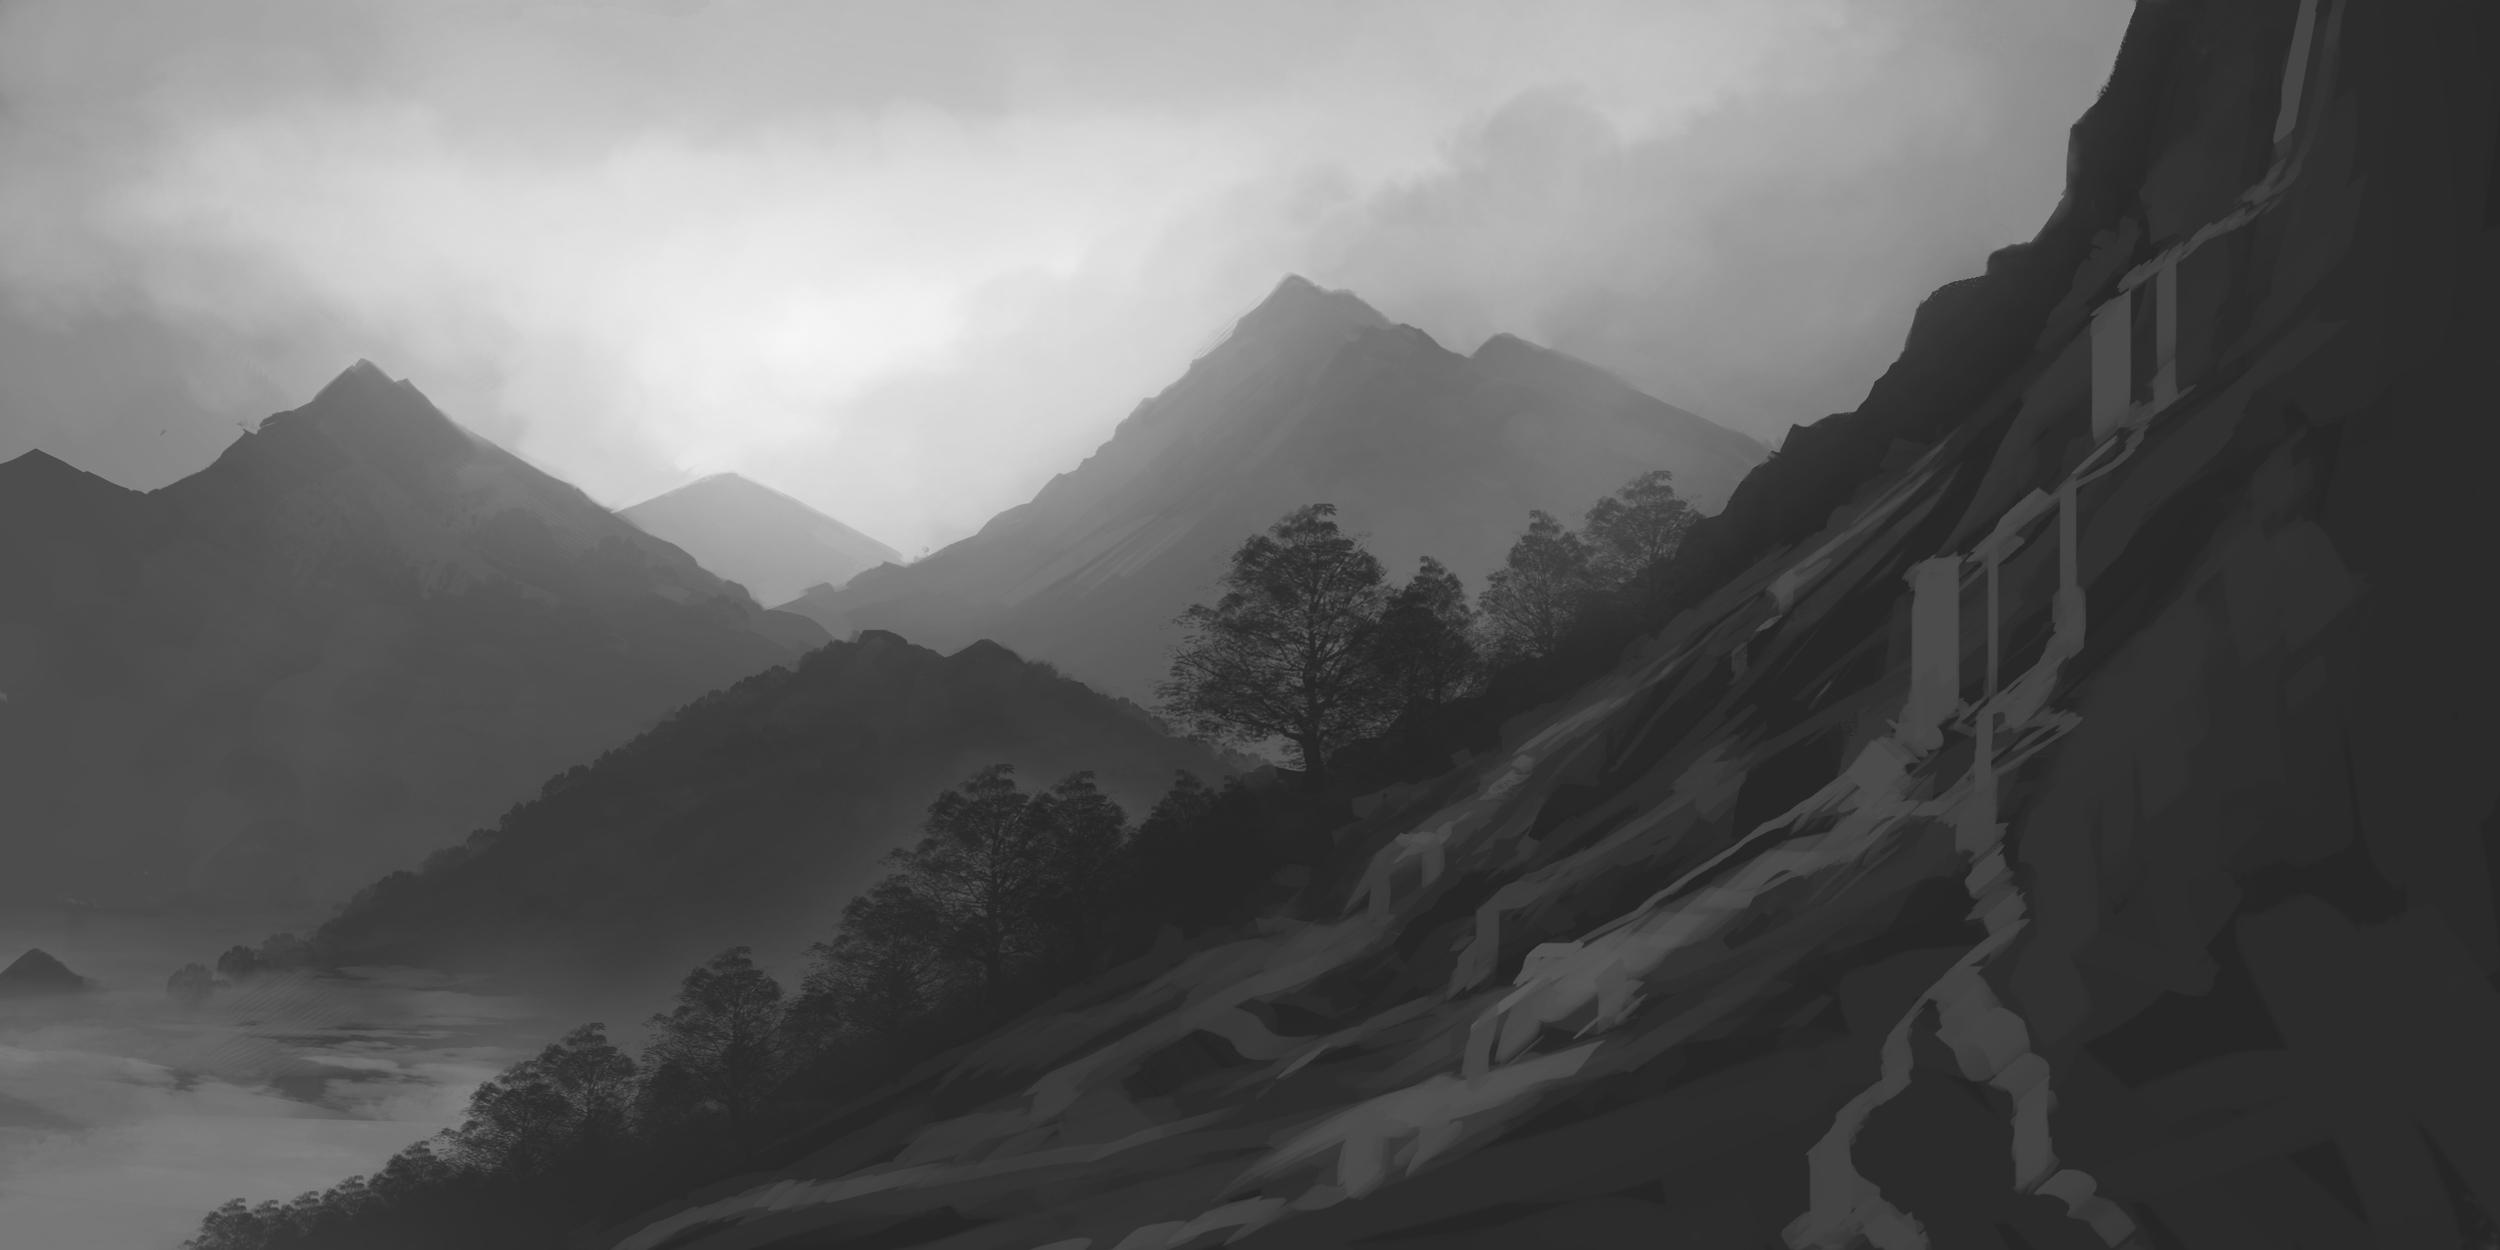 James_Chao_Mountain_Sketch